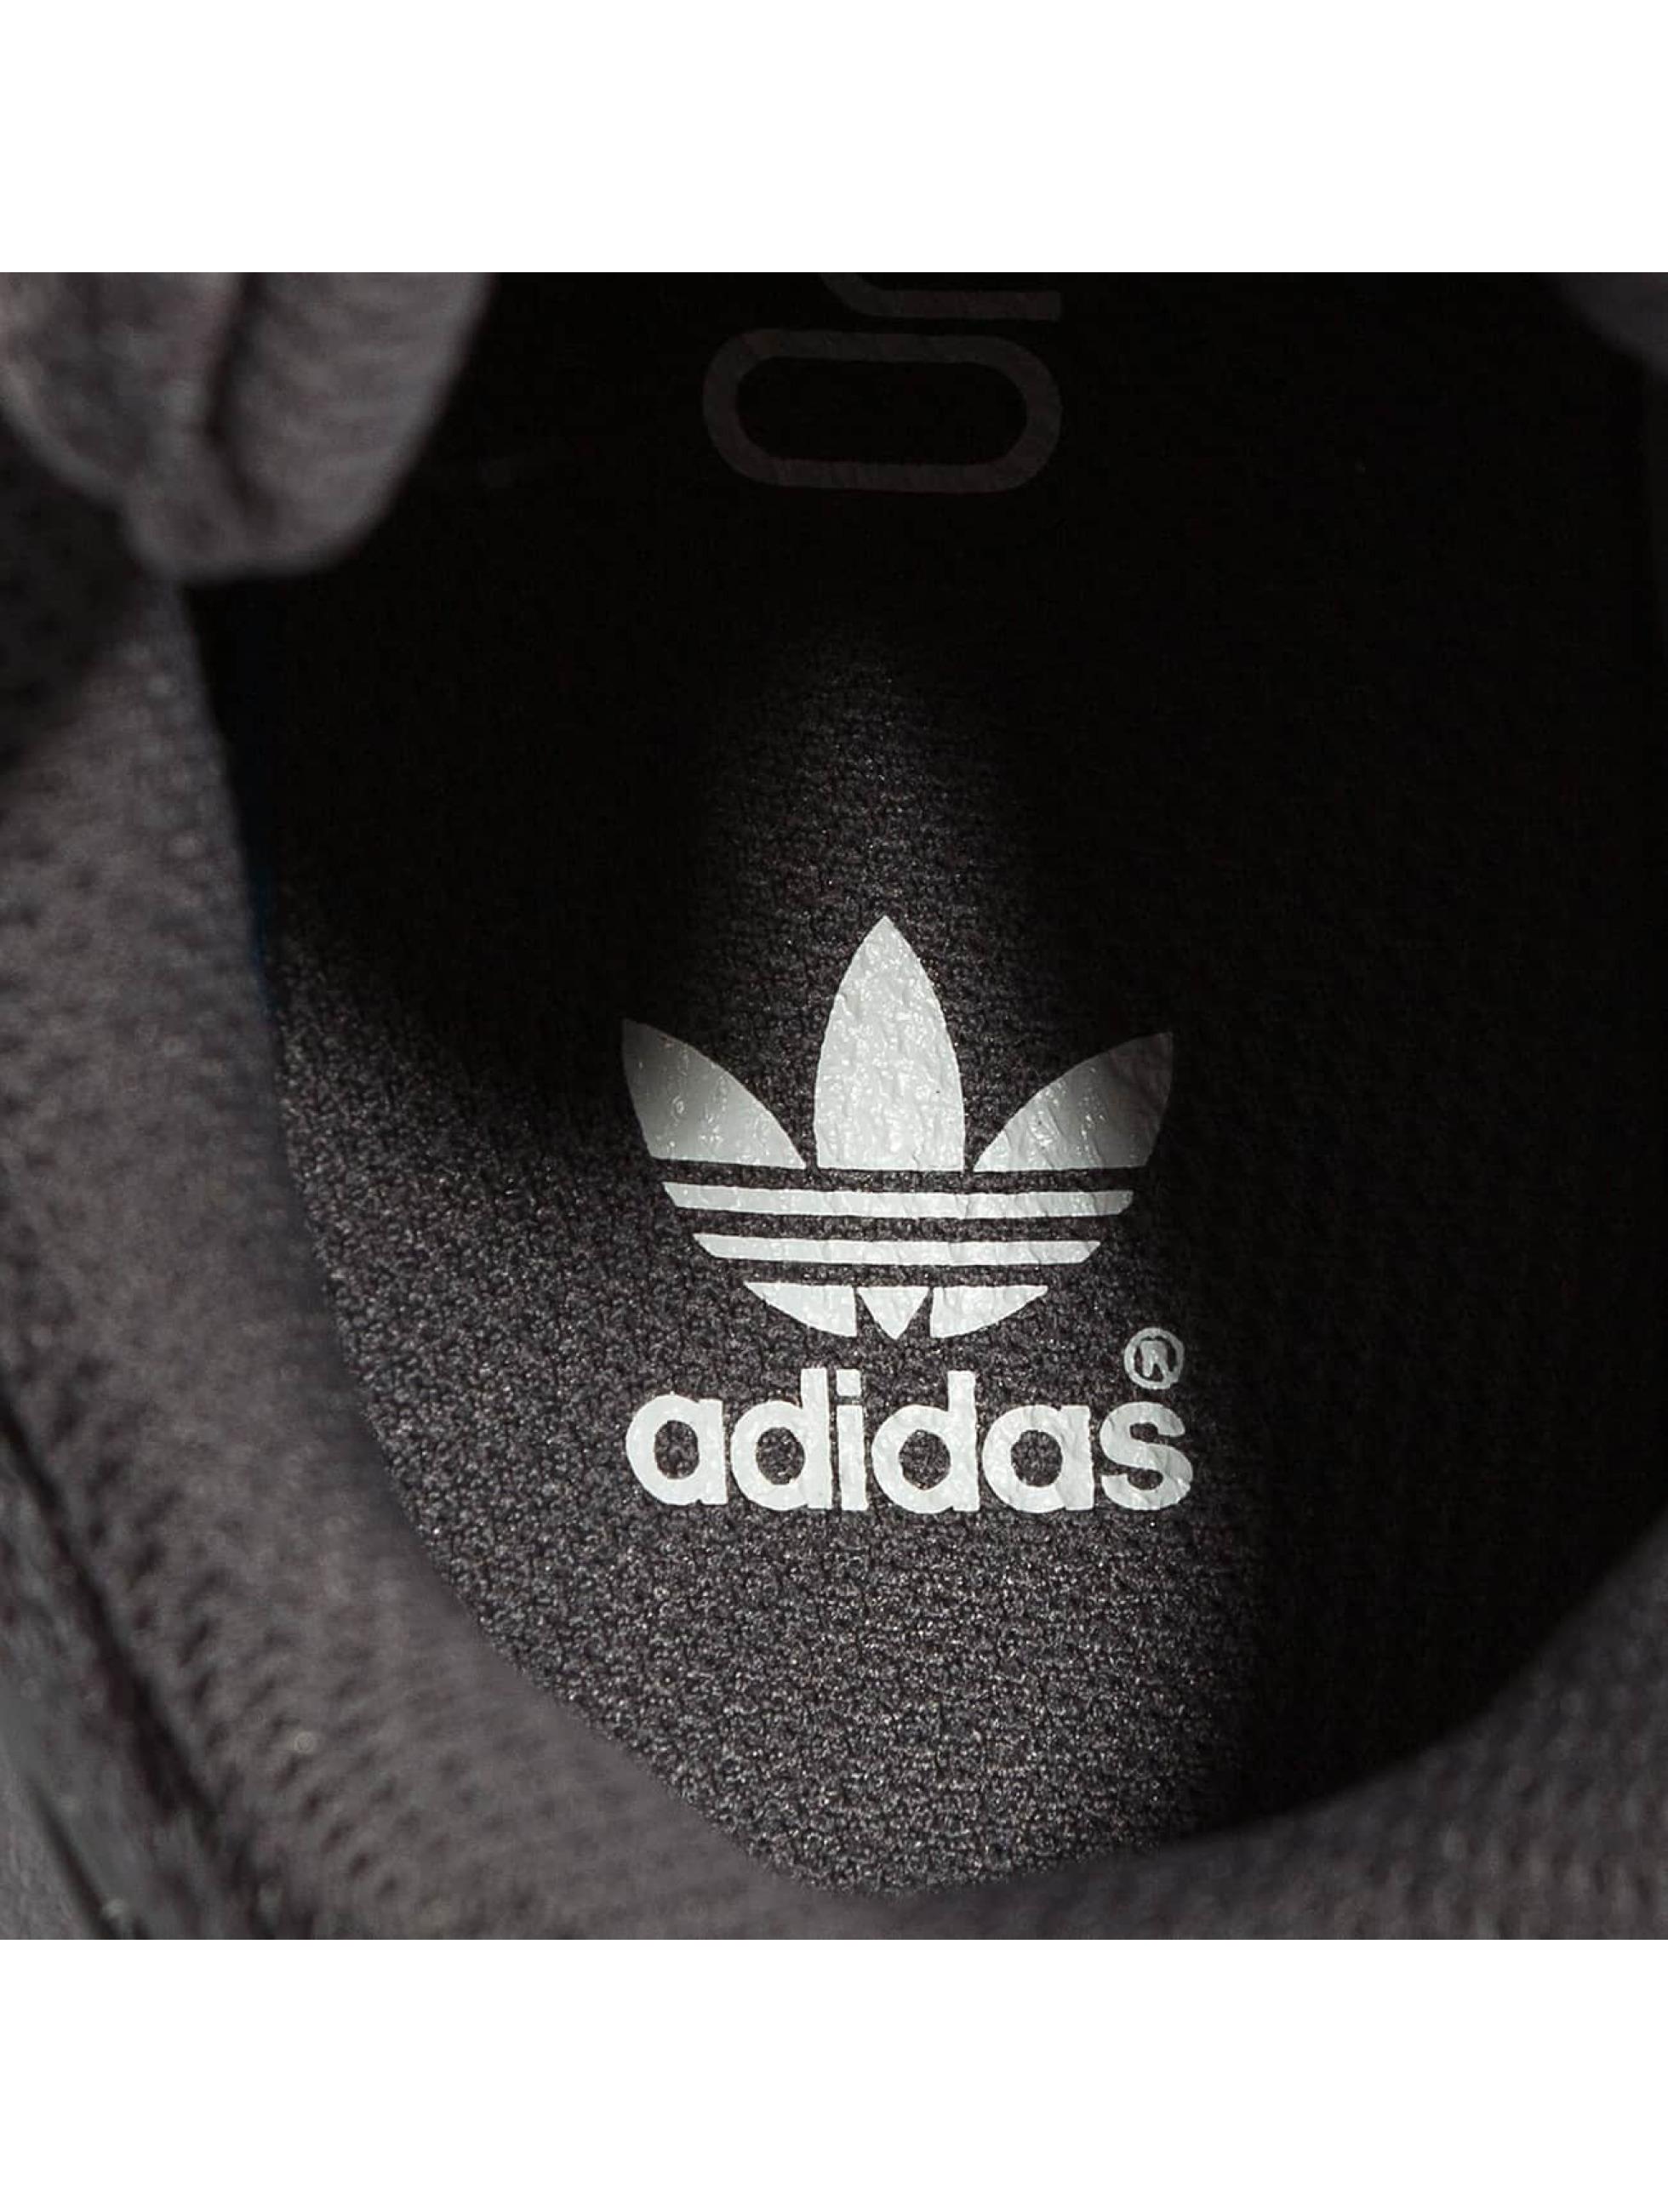 adidas Sneakers ZX Flux J gray